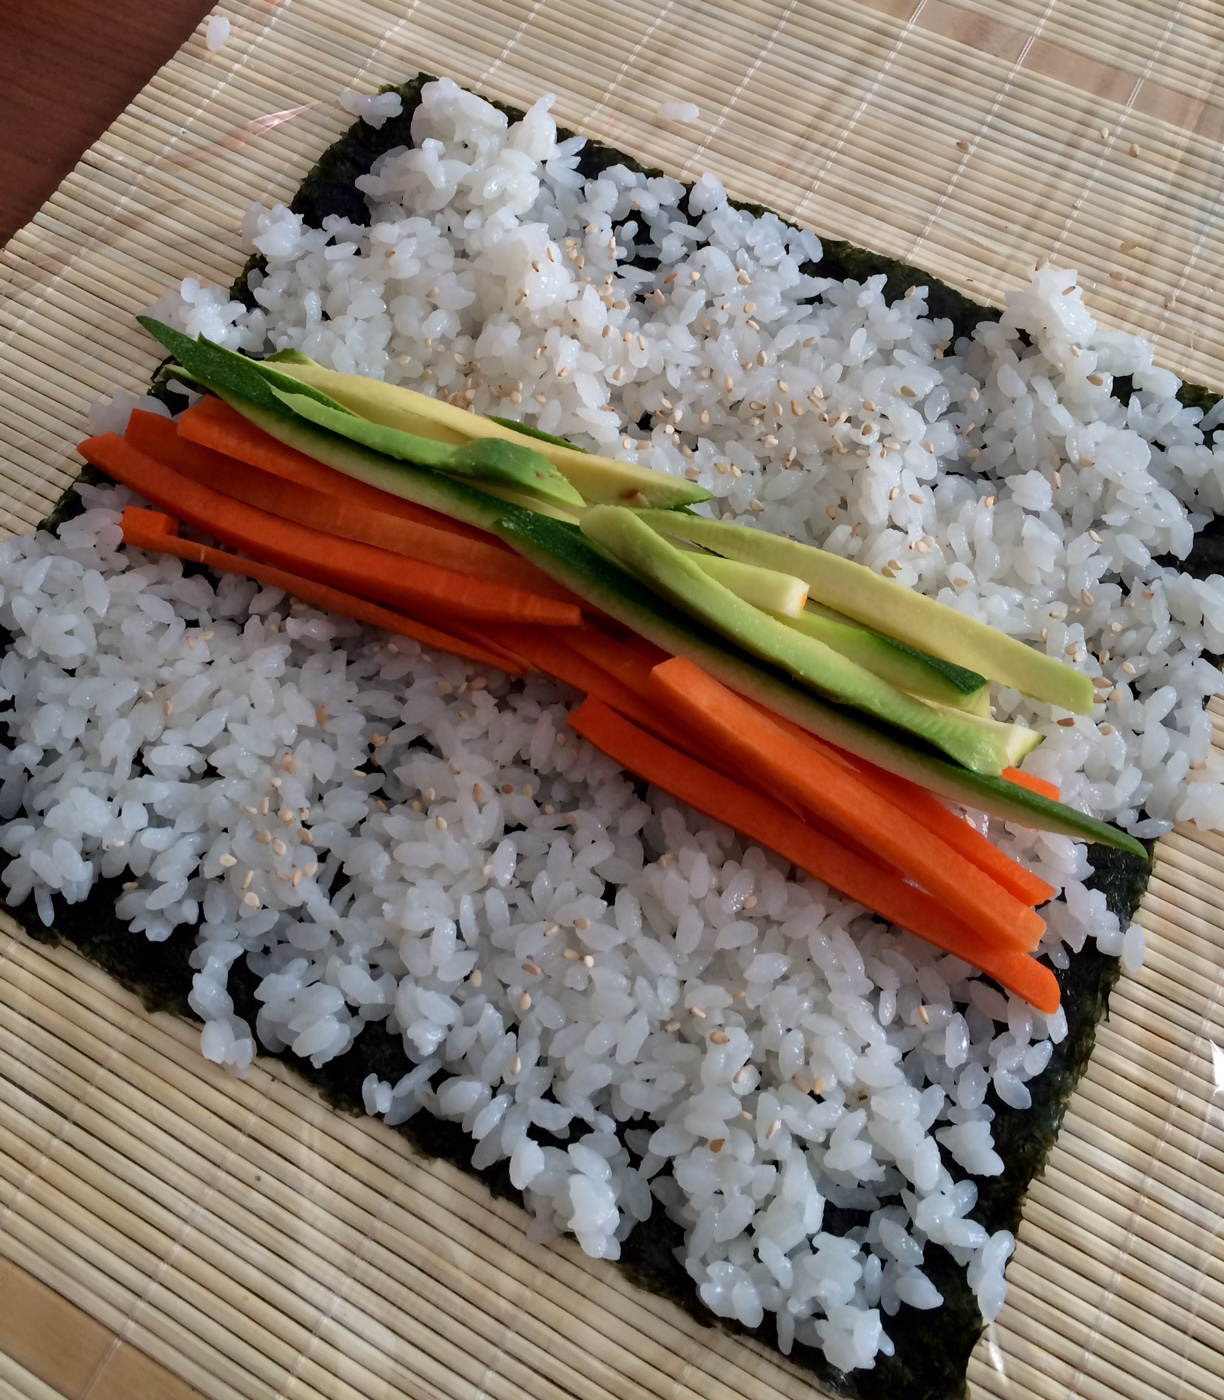 ricettevegan.org - sushi vegan 11